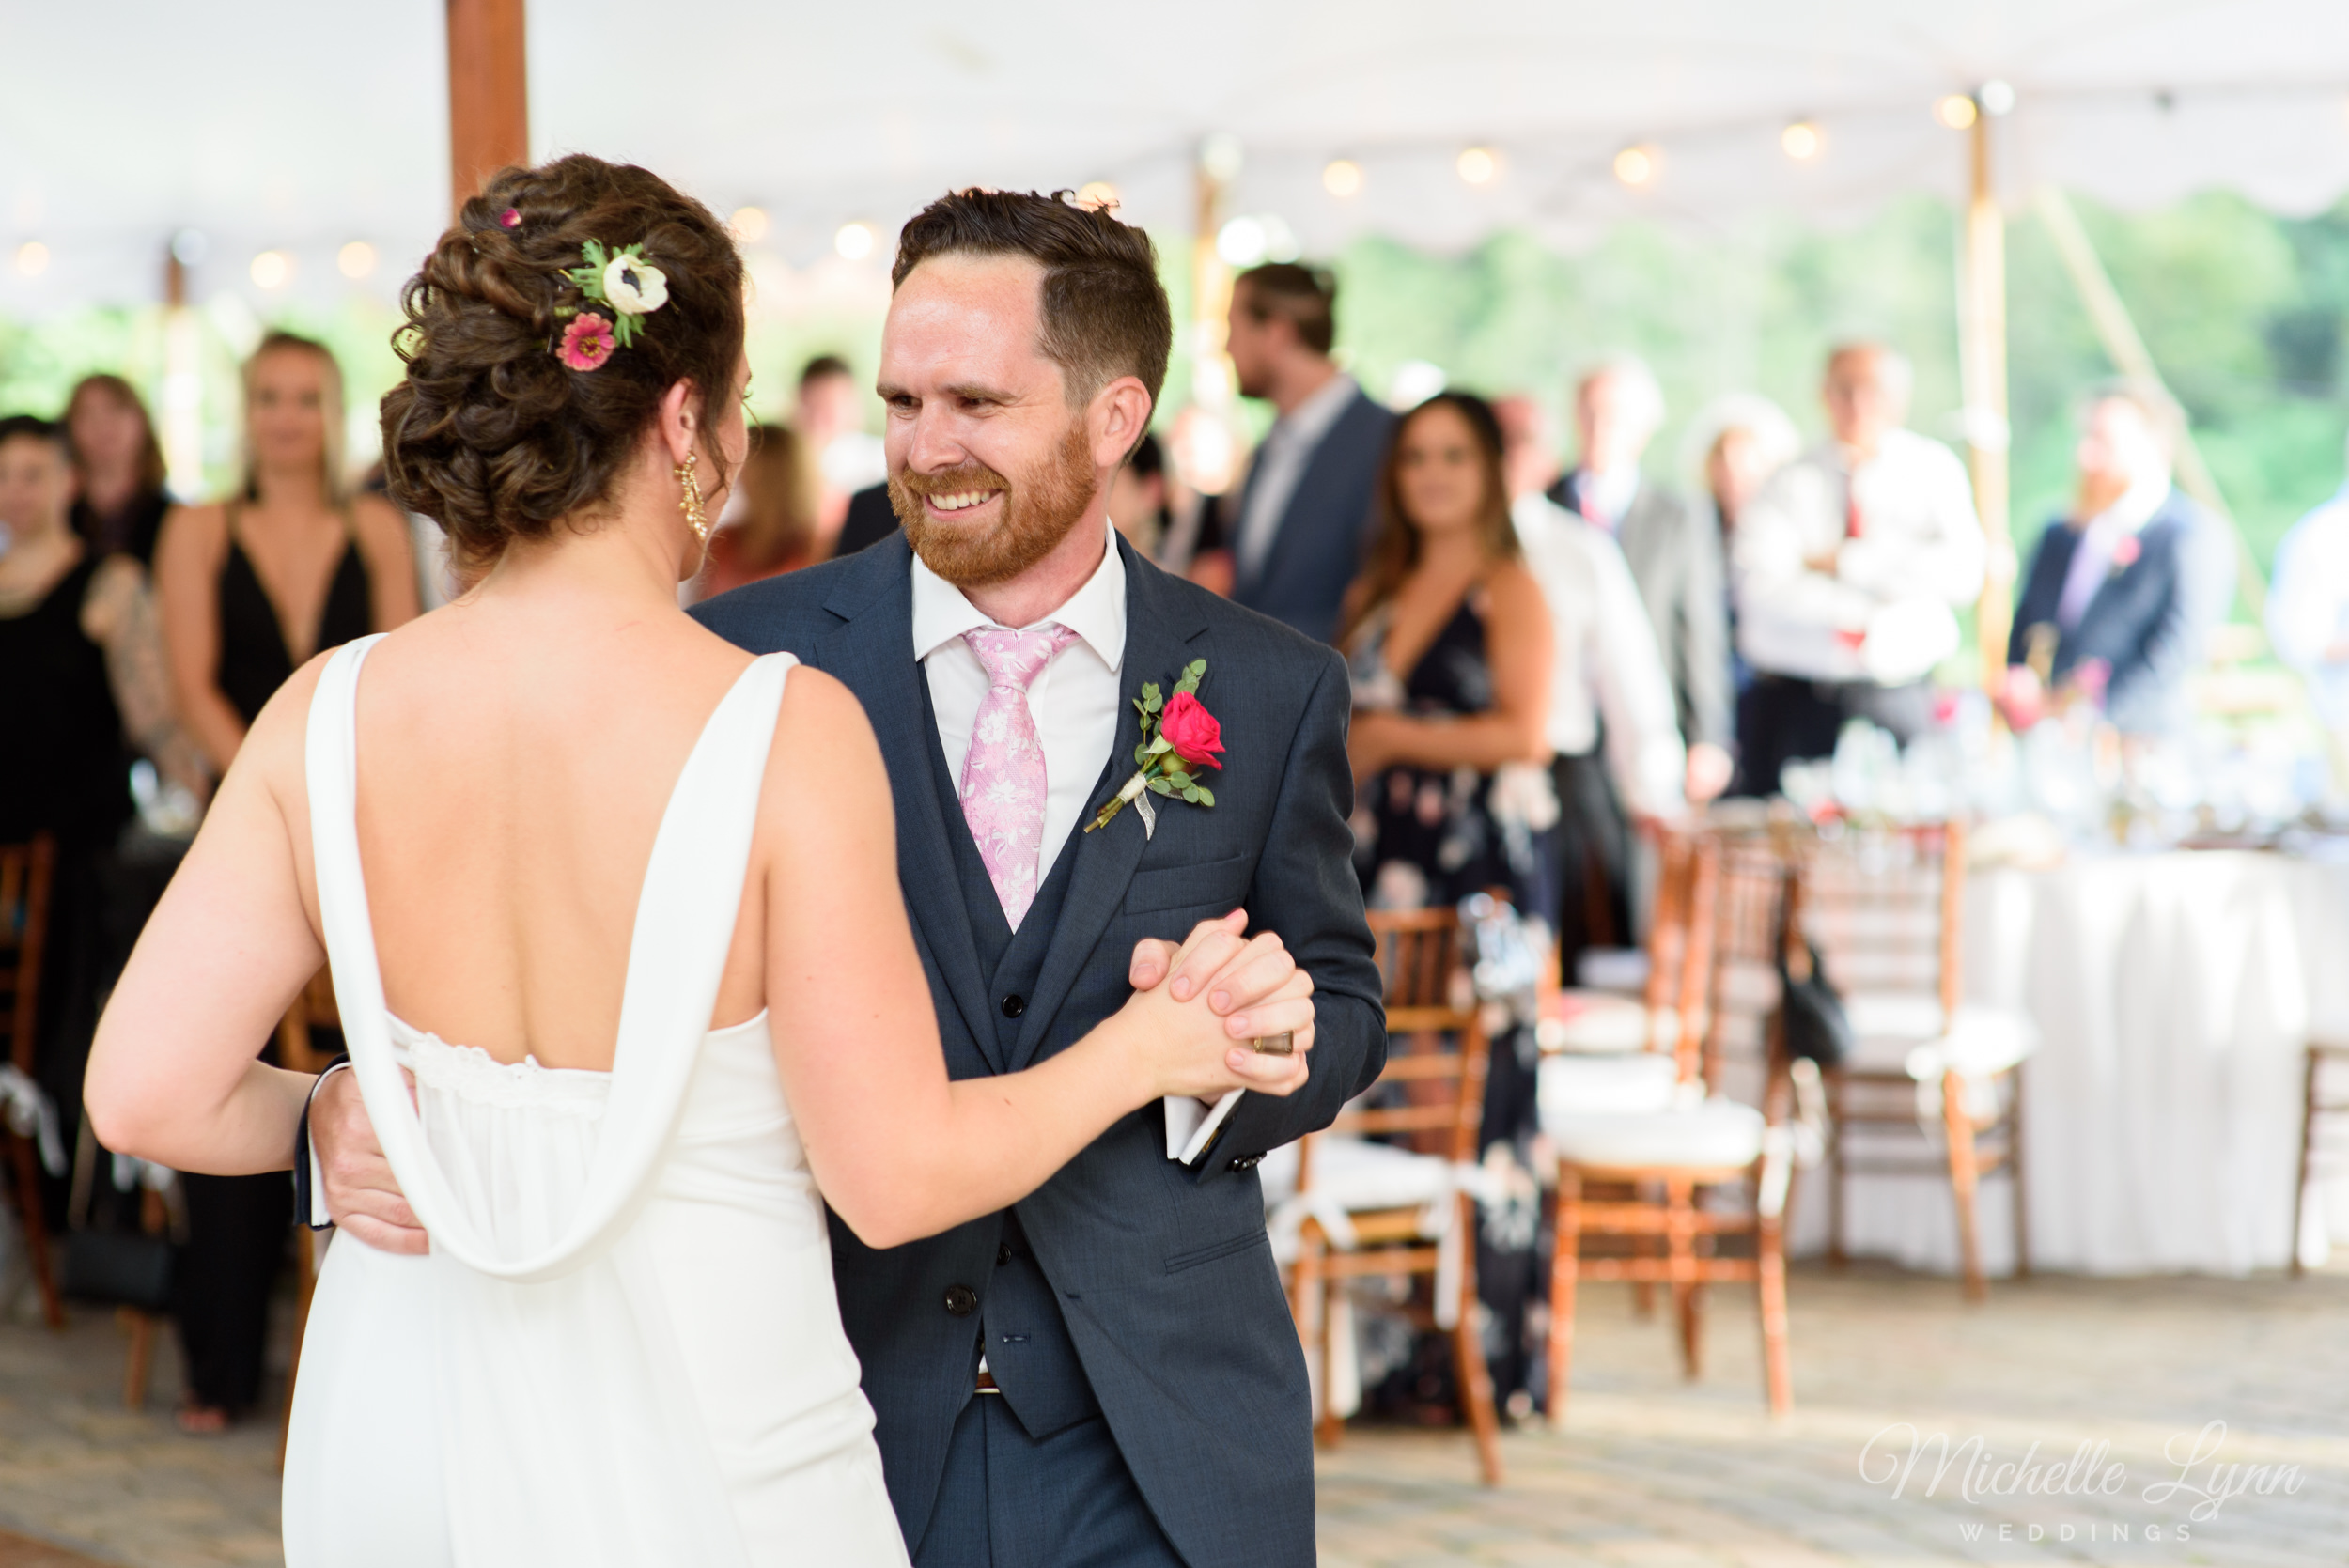 mlw-unionville-vineyards-nj-wedding-photography-82.jpg